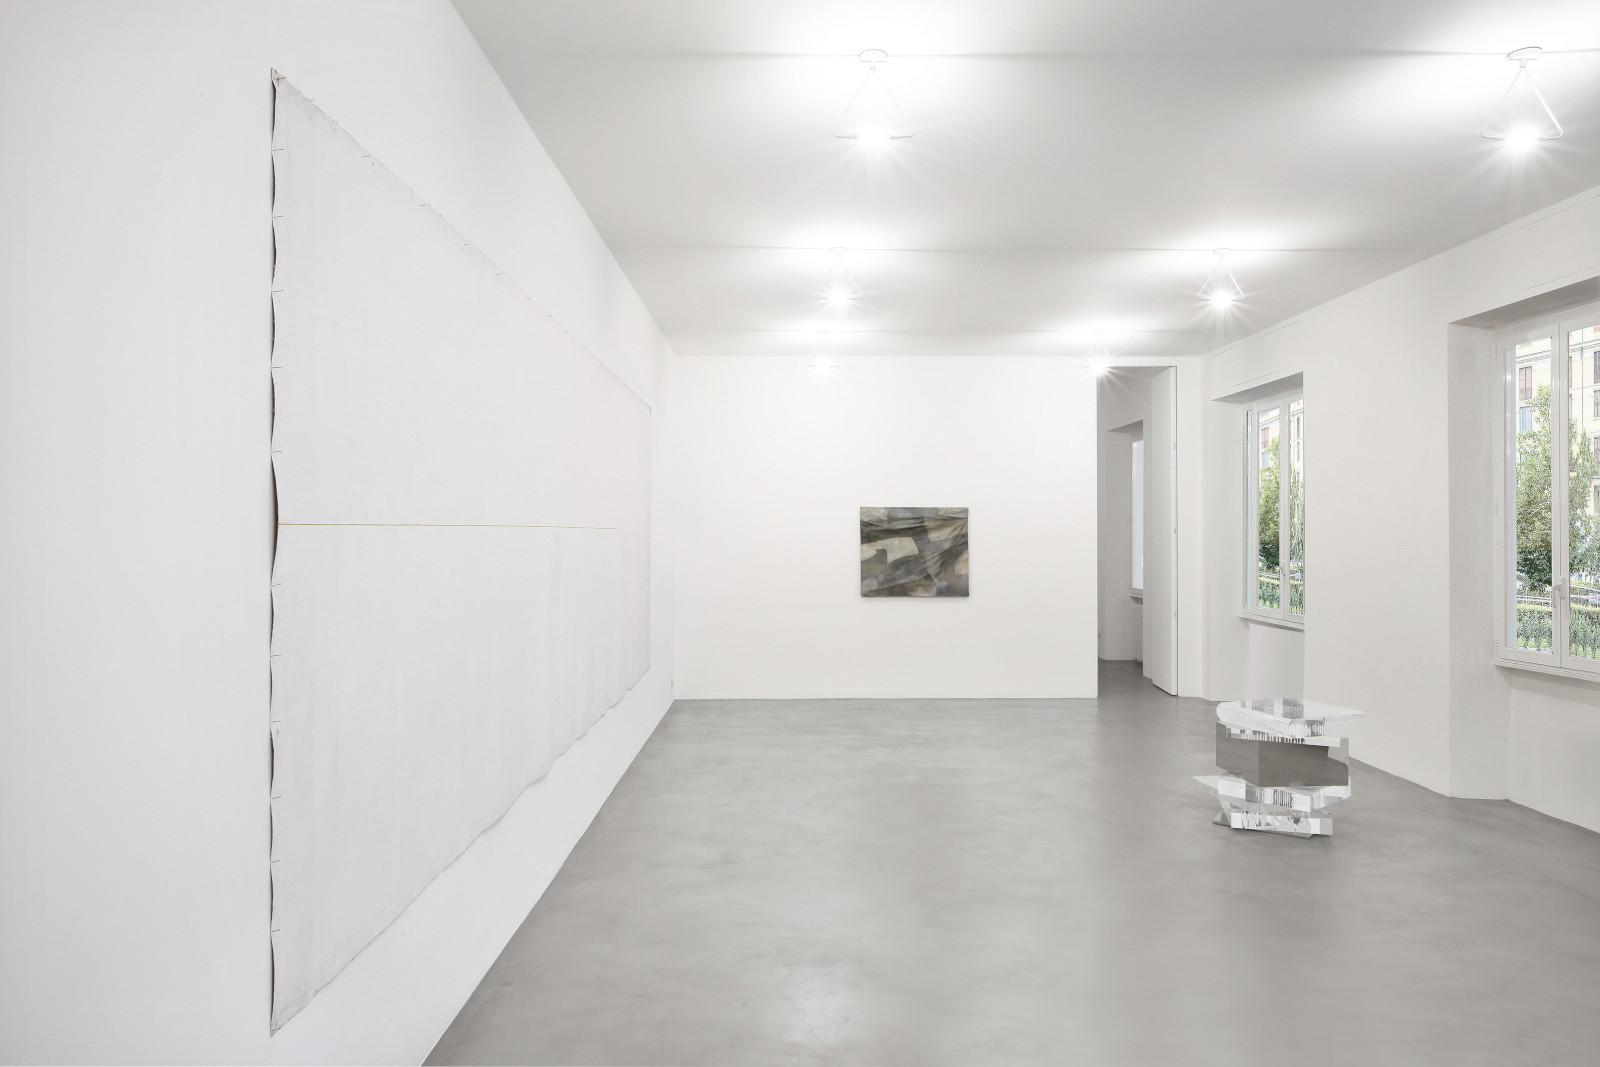 A Arte Invernizzi Gunter Umberg and the Italian Art 1